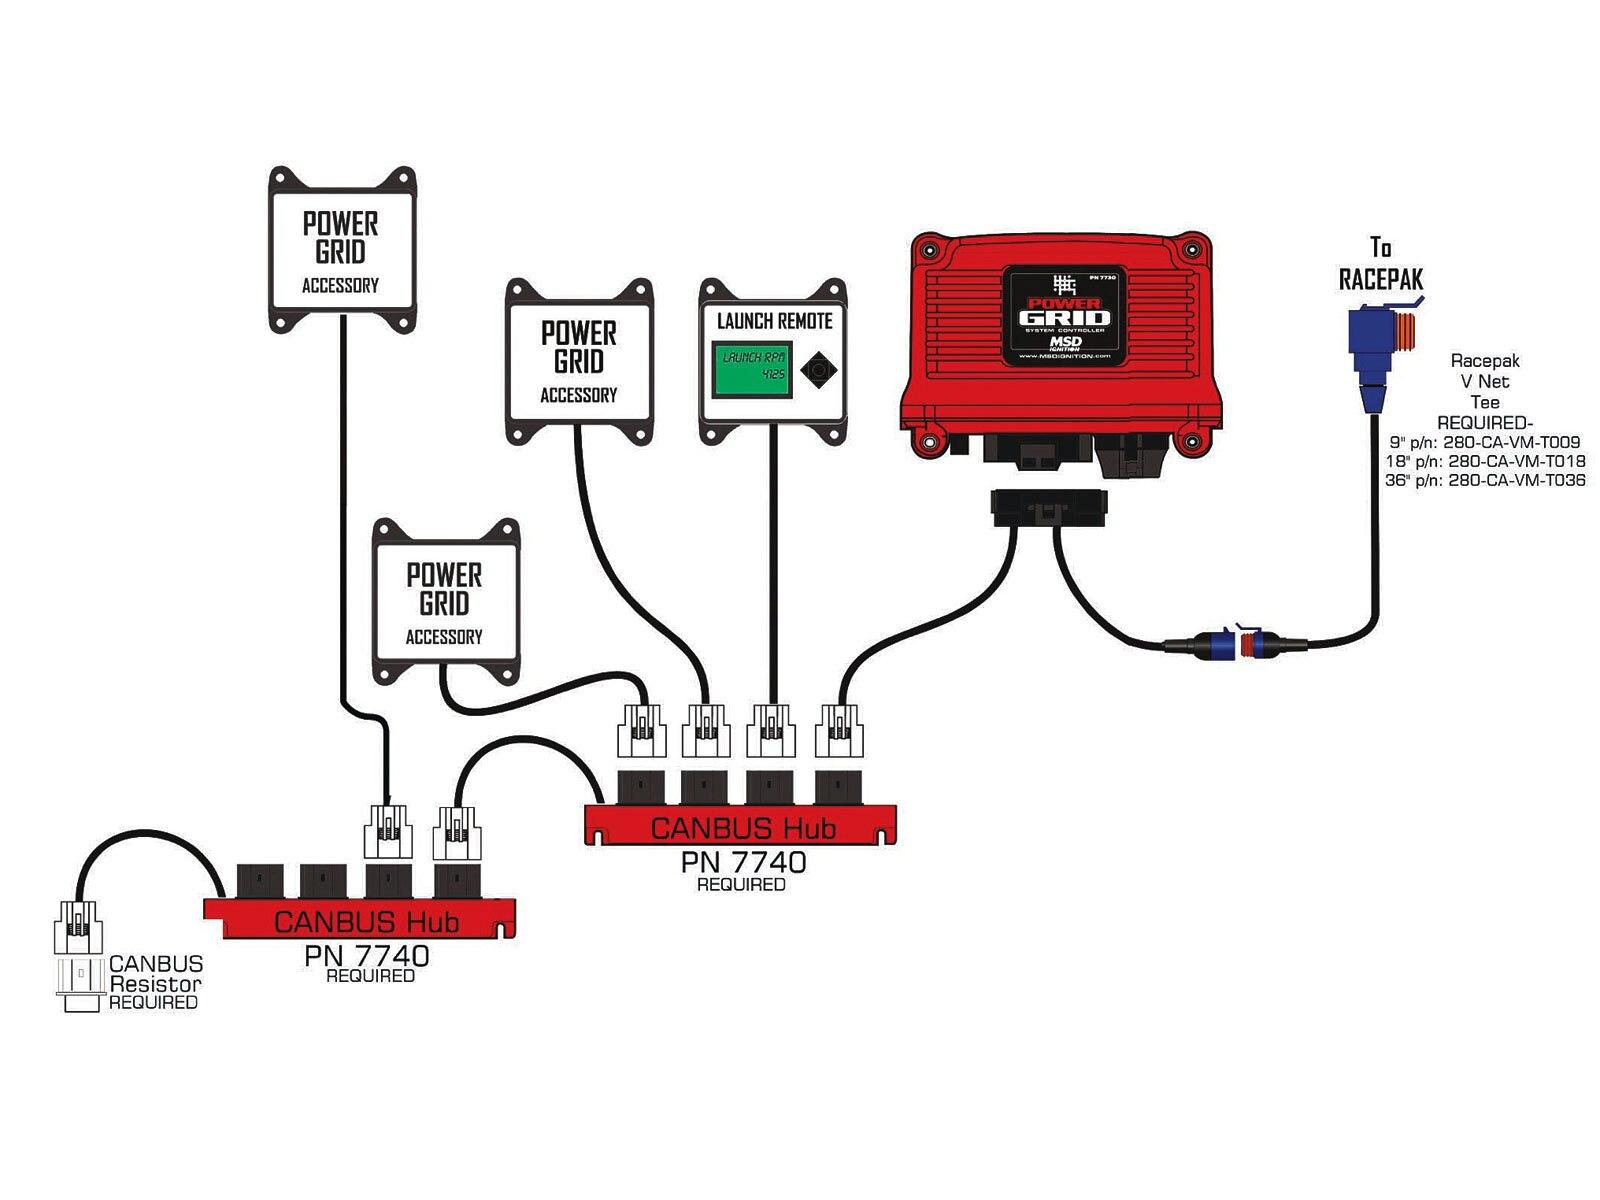 [SCHEMATICS_44OR]  AL_8082] Msd Power Grid Wiring Diagram Free Image About Wiring Diagram And  Free Diagram | Power Grid Wiring Harness |  | Ophag Numap Mohammedshrine Librar Wiring 101